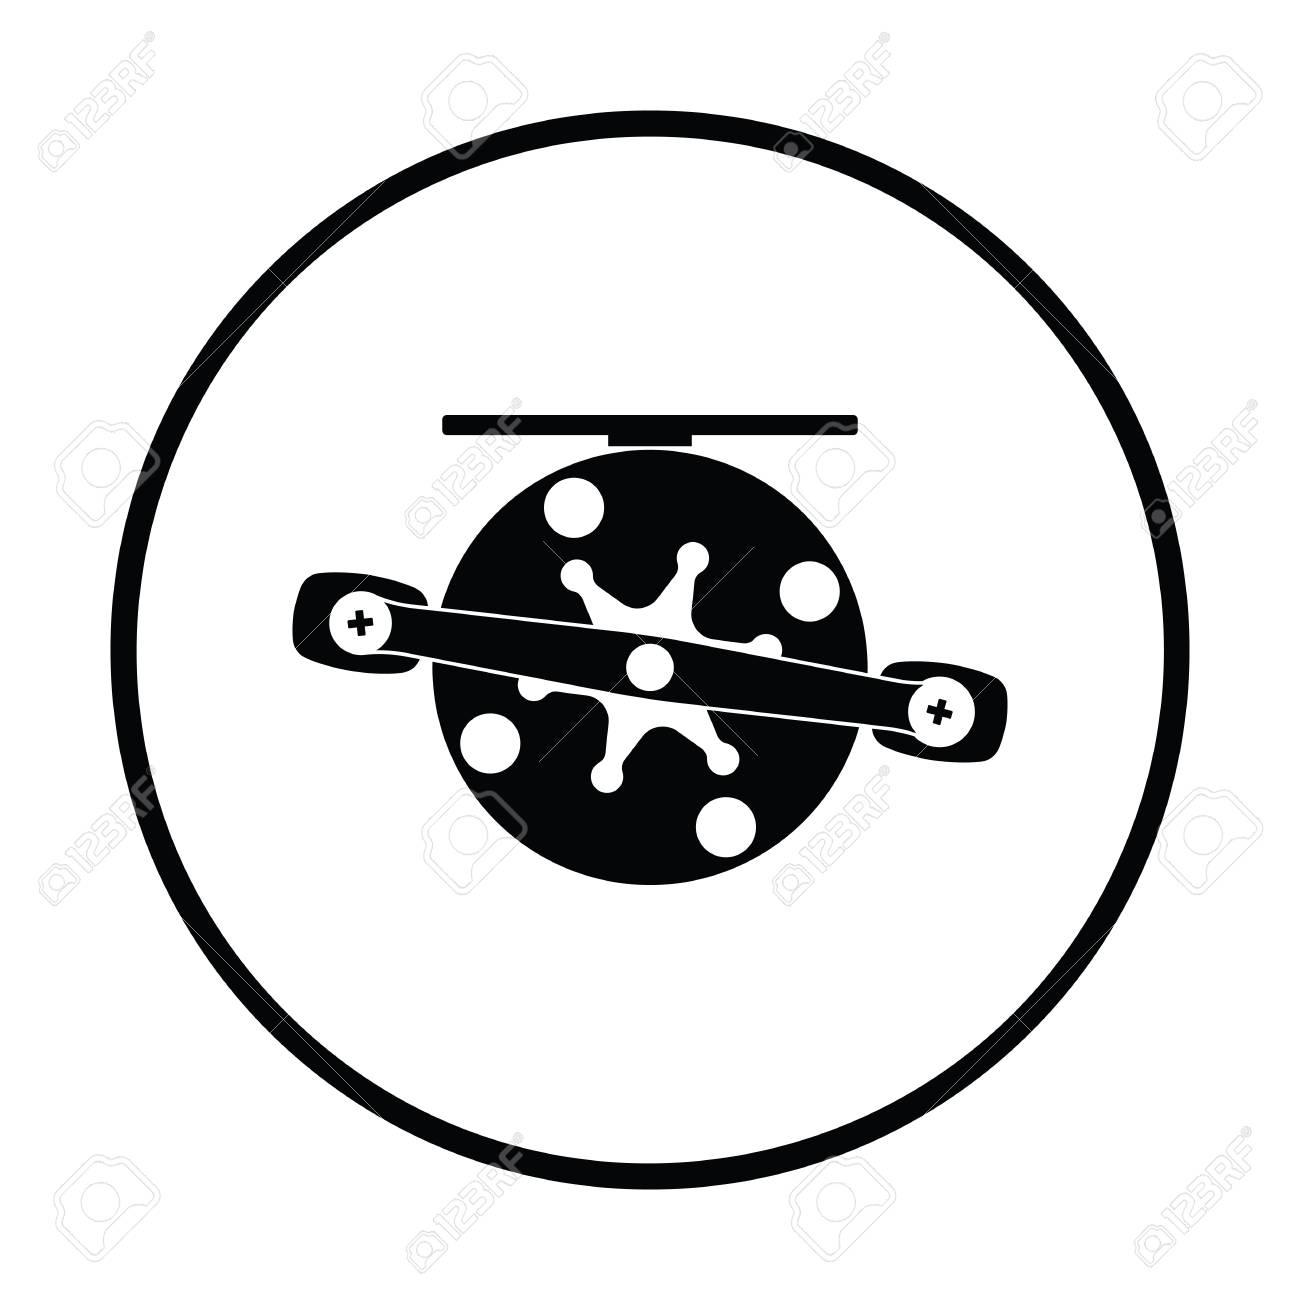 Icon Of Fishing Reel Thin Circle Design Vector Illustration